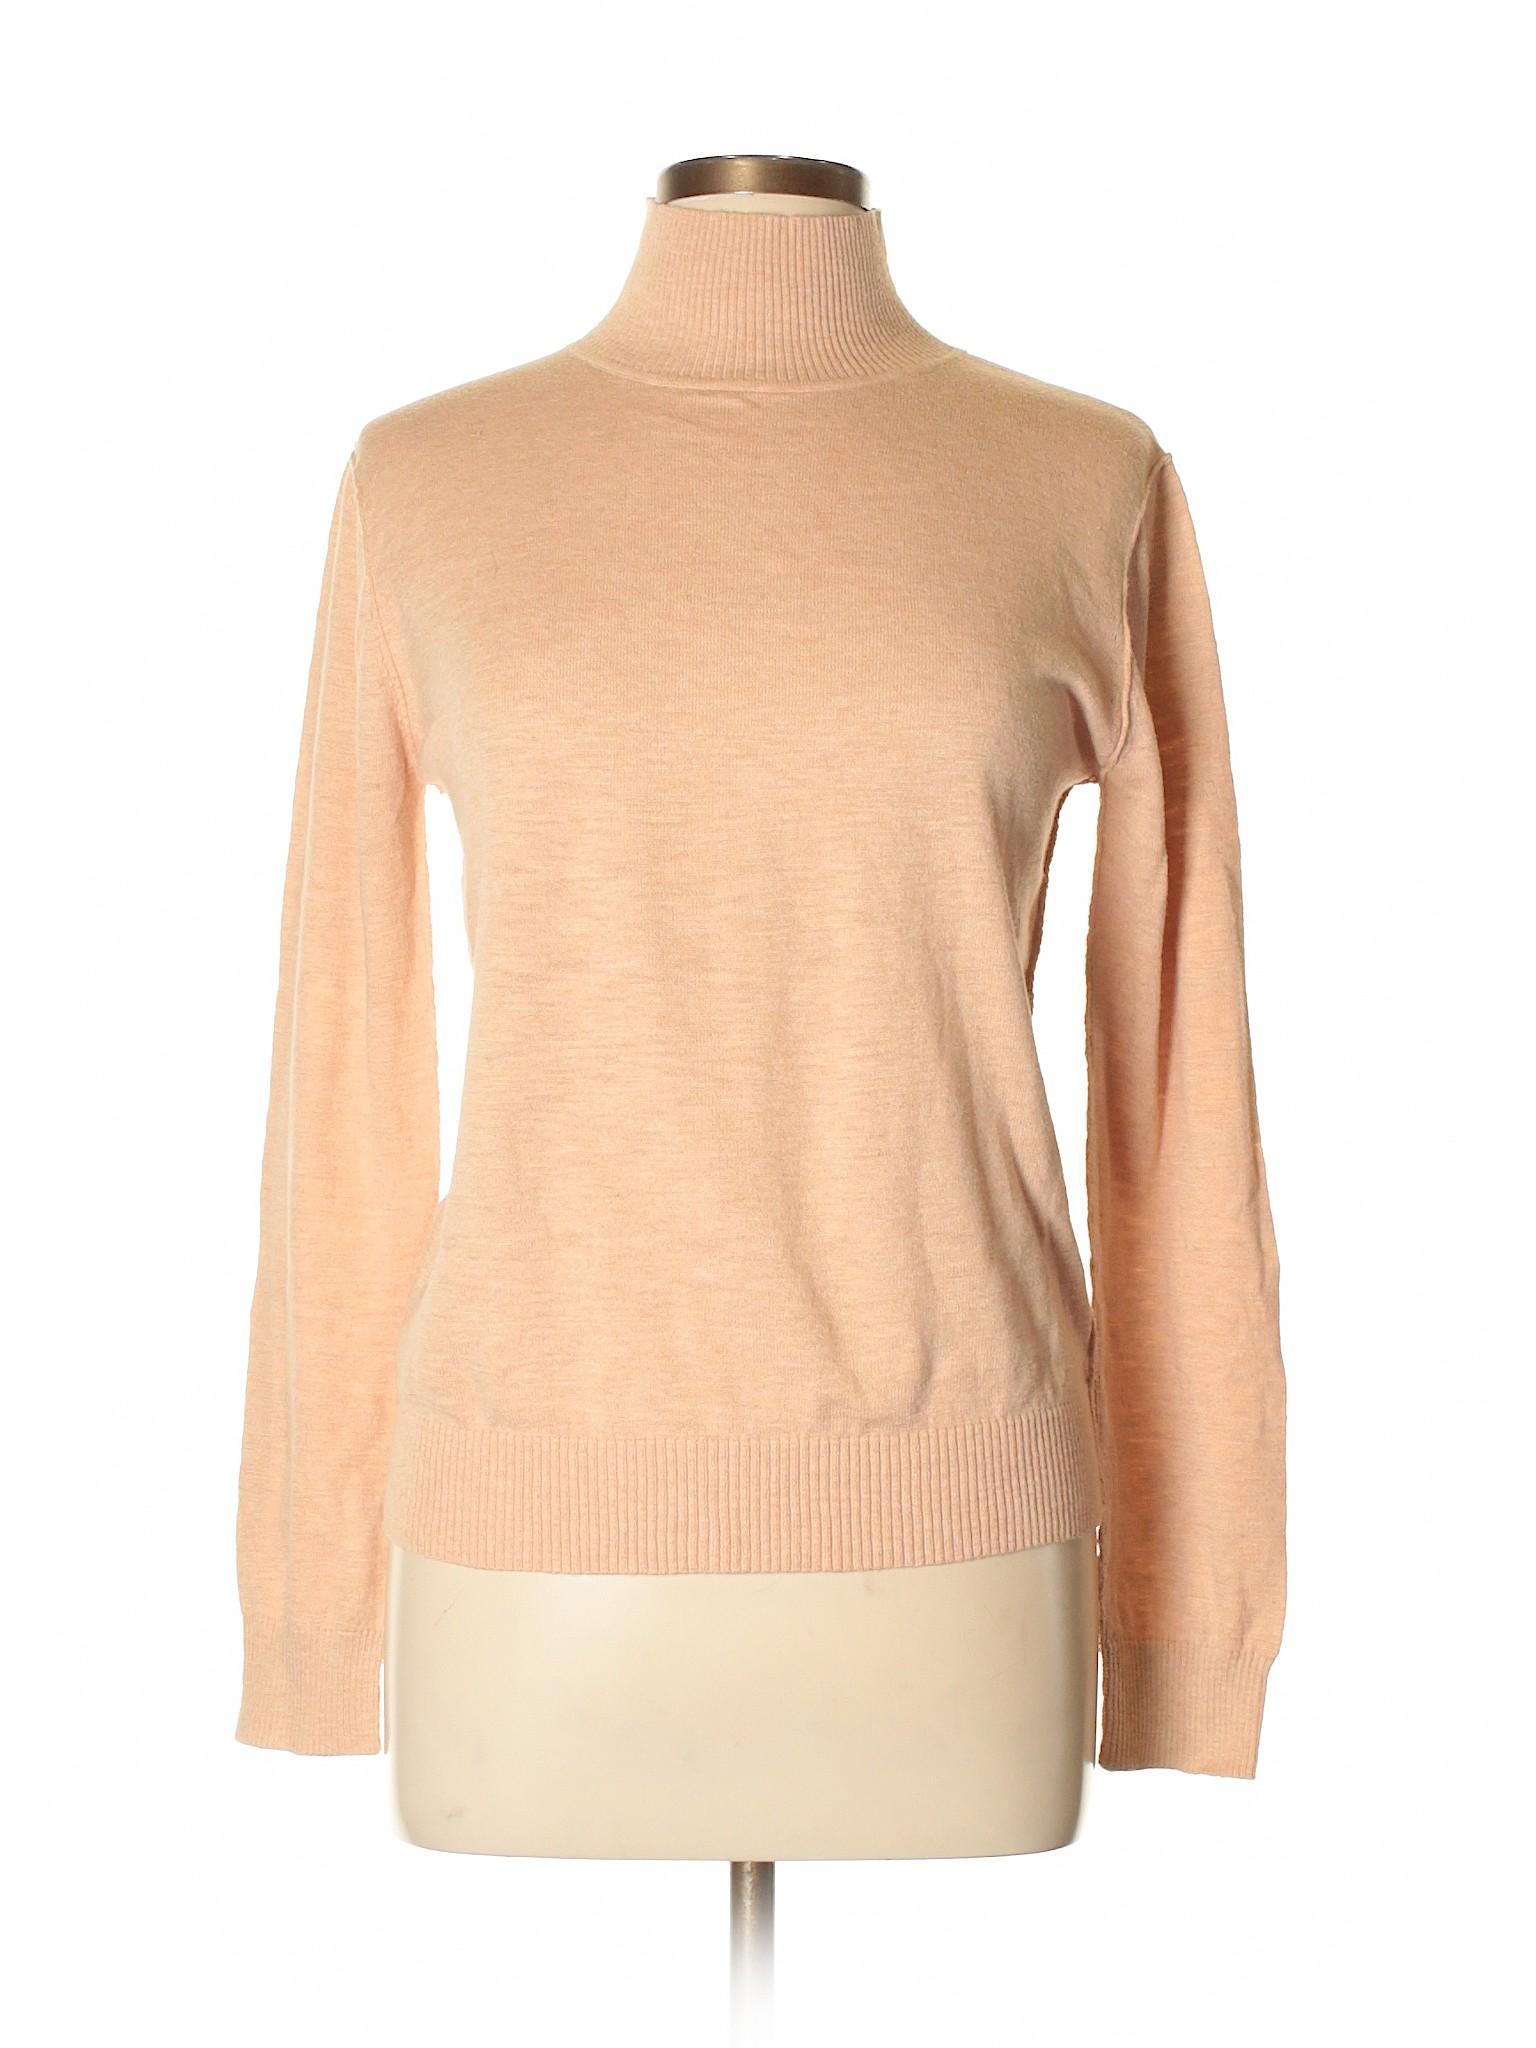 winter winter Mango Mango Boutique Boutique Pullover Sweater Pullover Sweater 55qXA